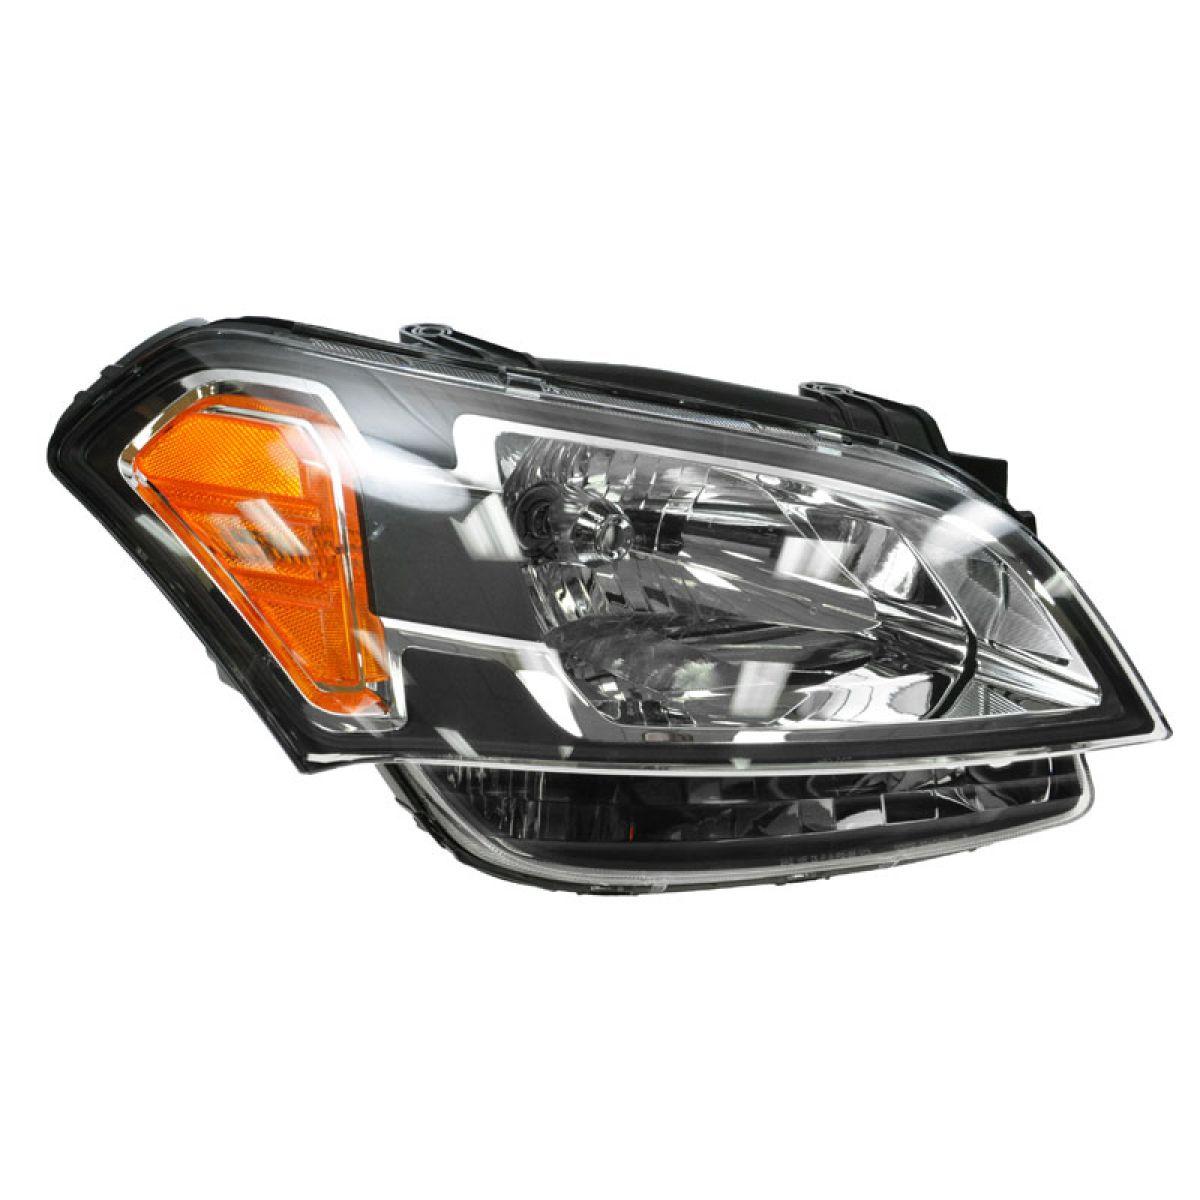 Headlight Headlamp Light Lamp Right Hand Passenger Side Rh